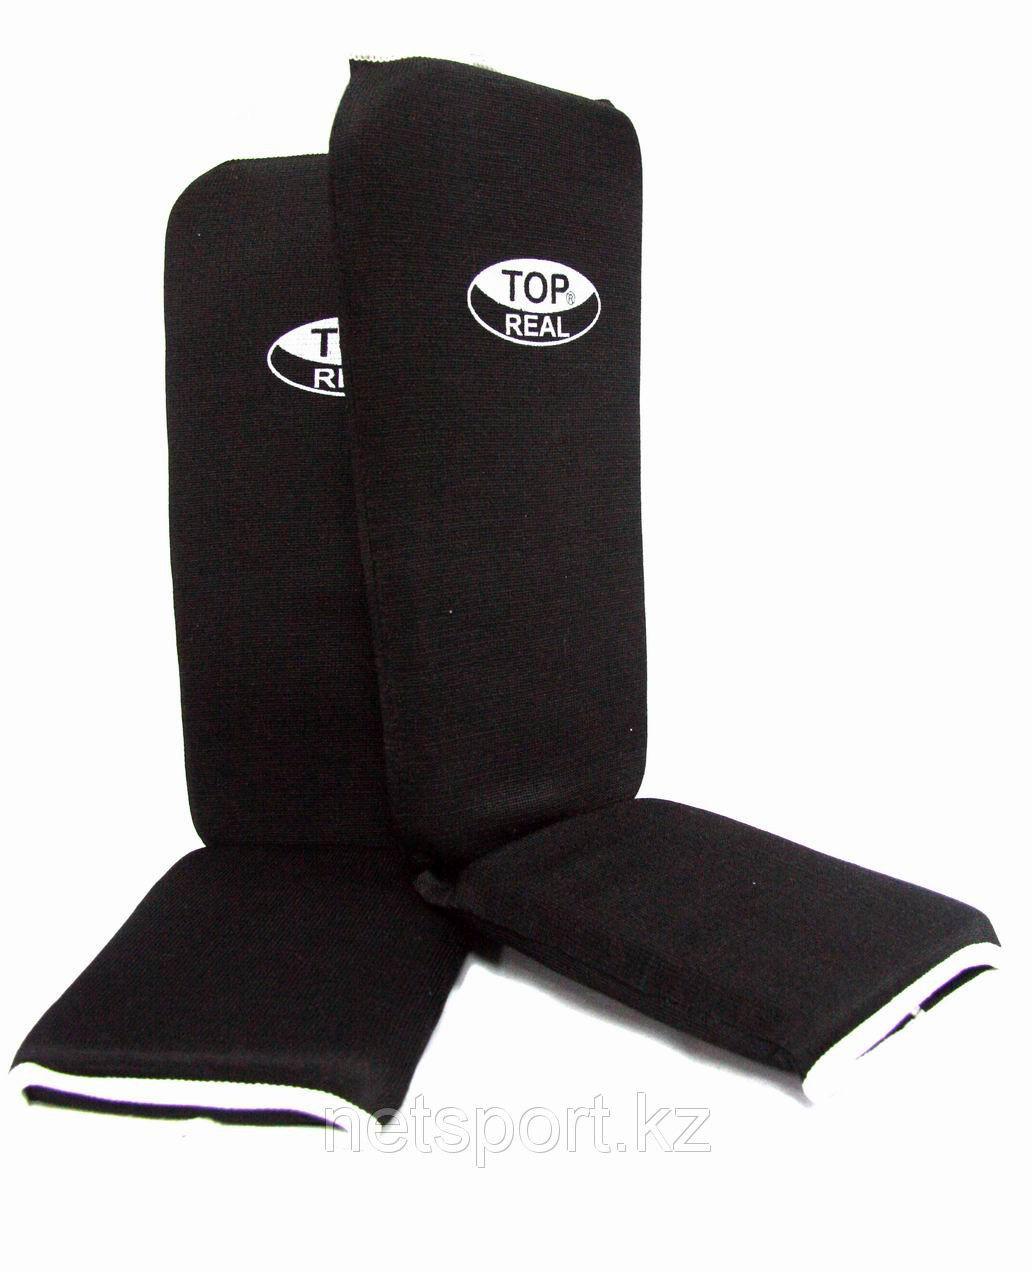 Щитки на ноги для карате